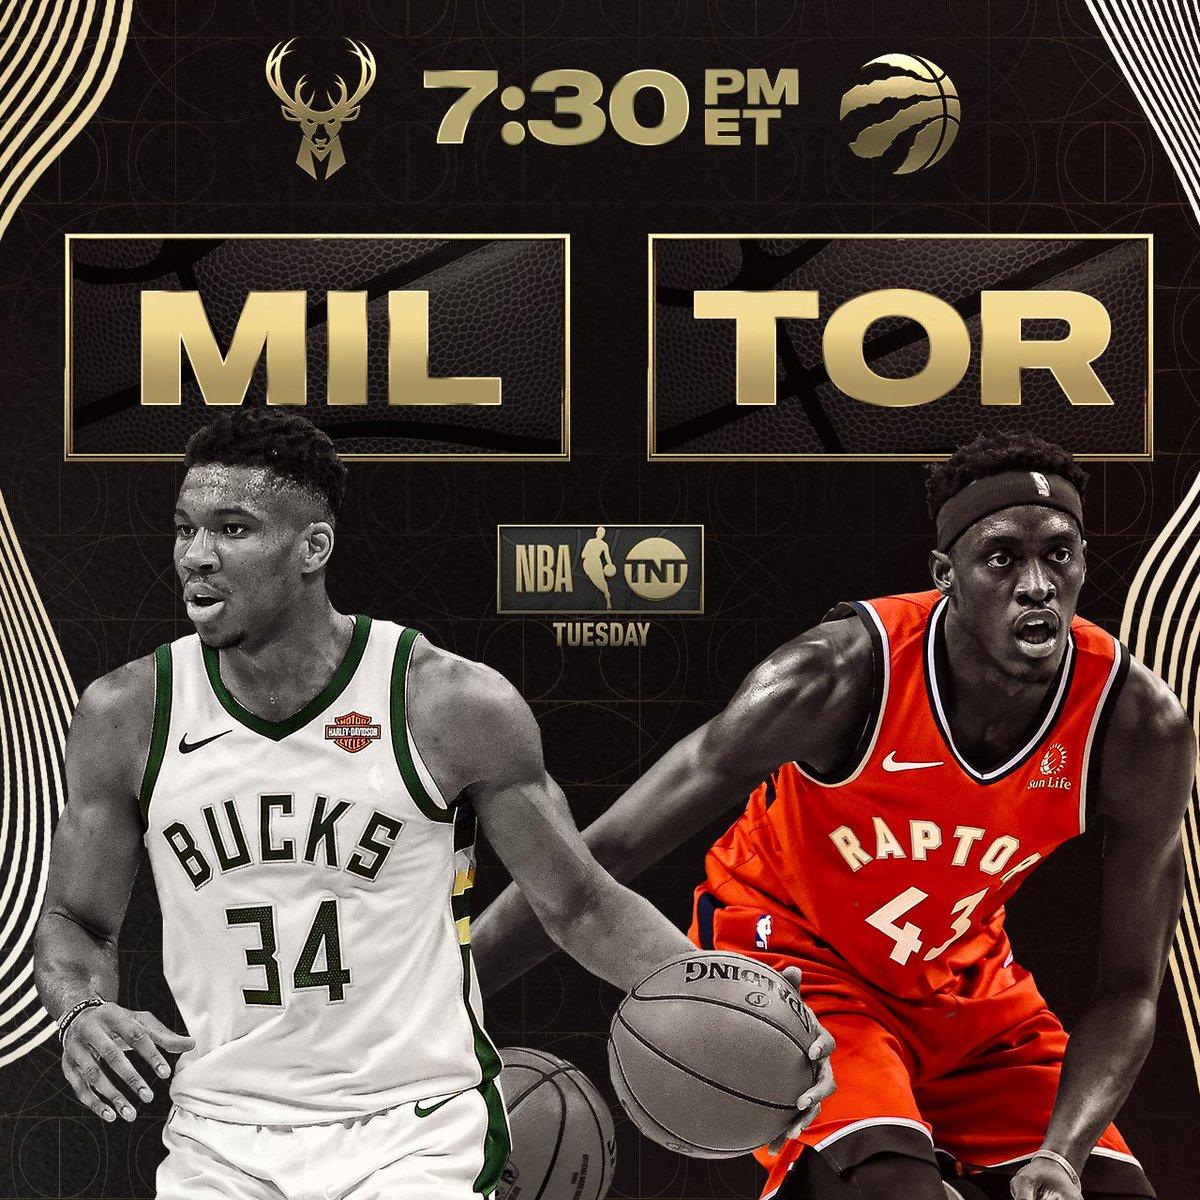 We've got an exciting doubleheader tonight on TNT! 🍿 @Bucks vs. @Raptors // 7:30pm ET @PelicansNBA vs. @Lakers // 10pm ET